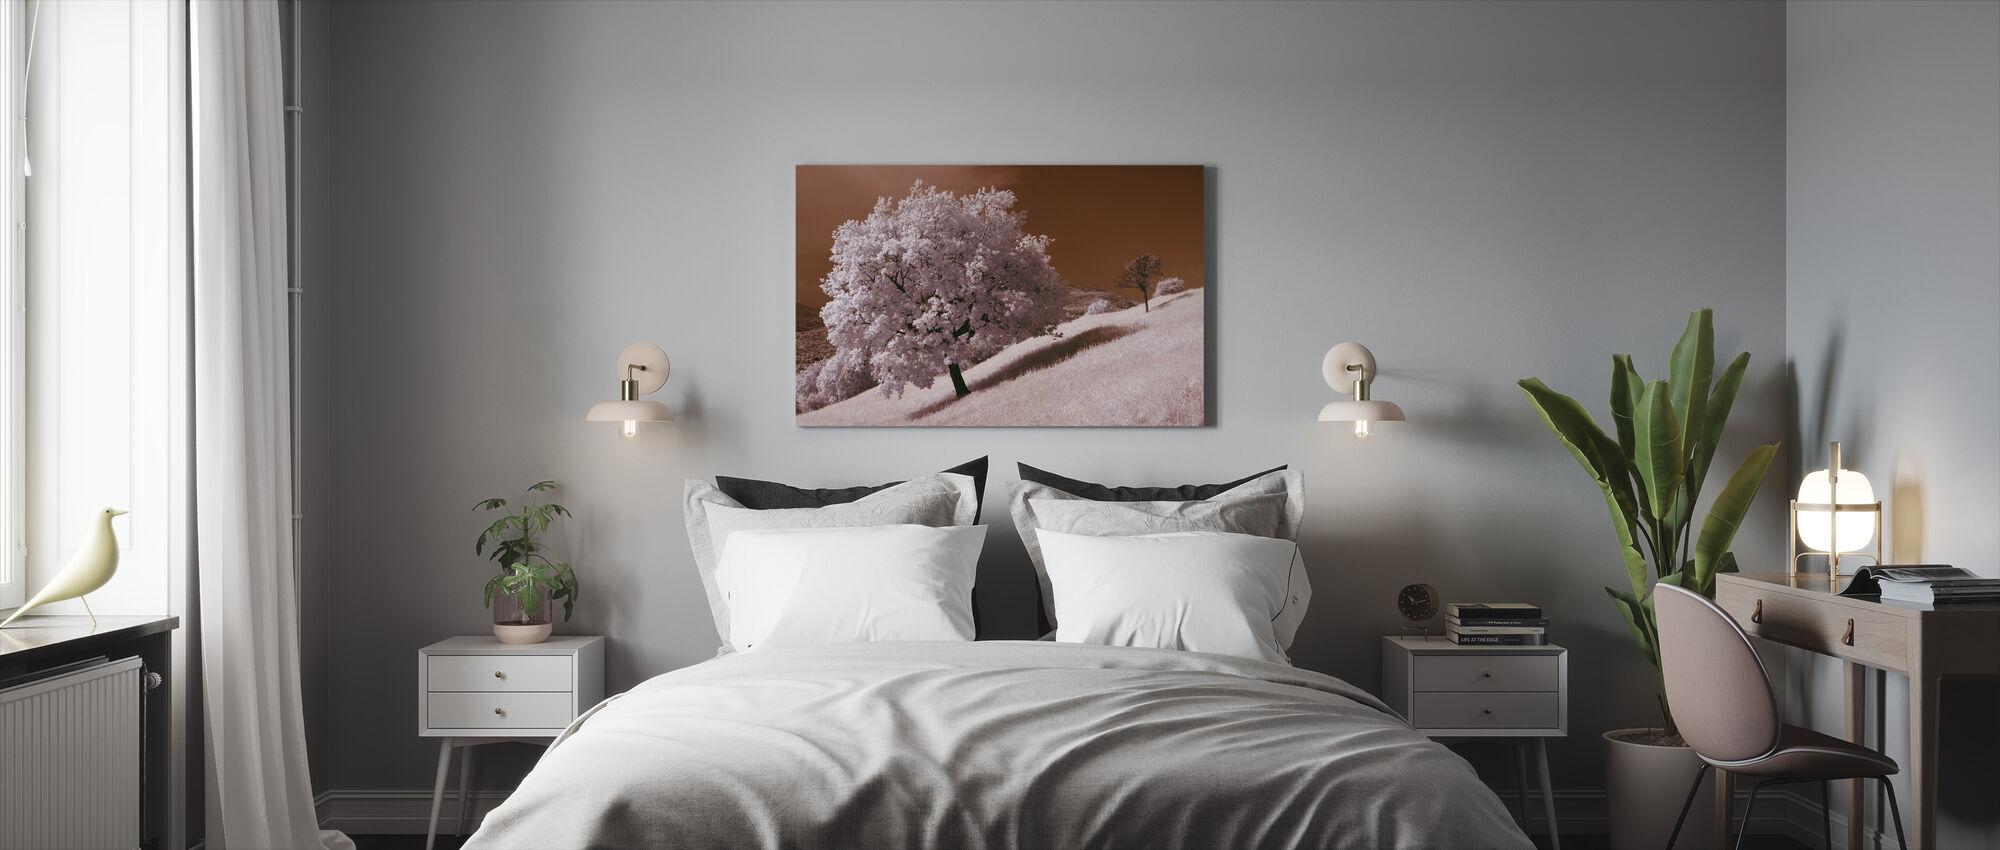 Tammi Puu - Canvastaulu - Makuuhuone